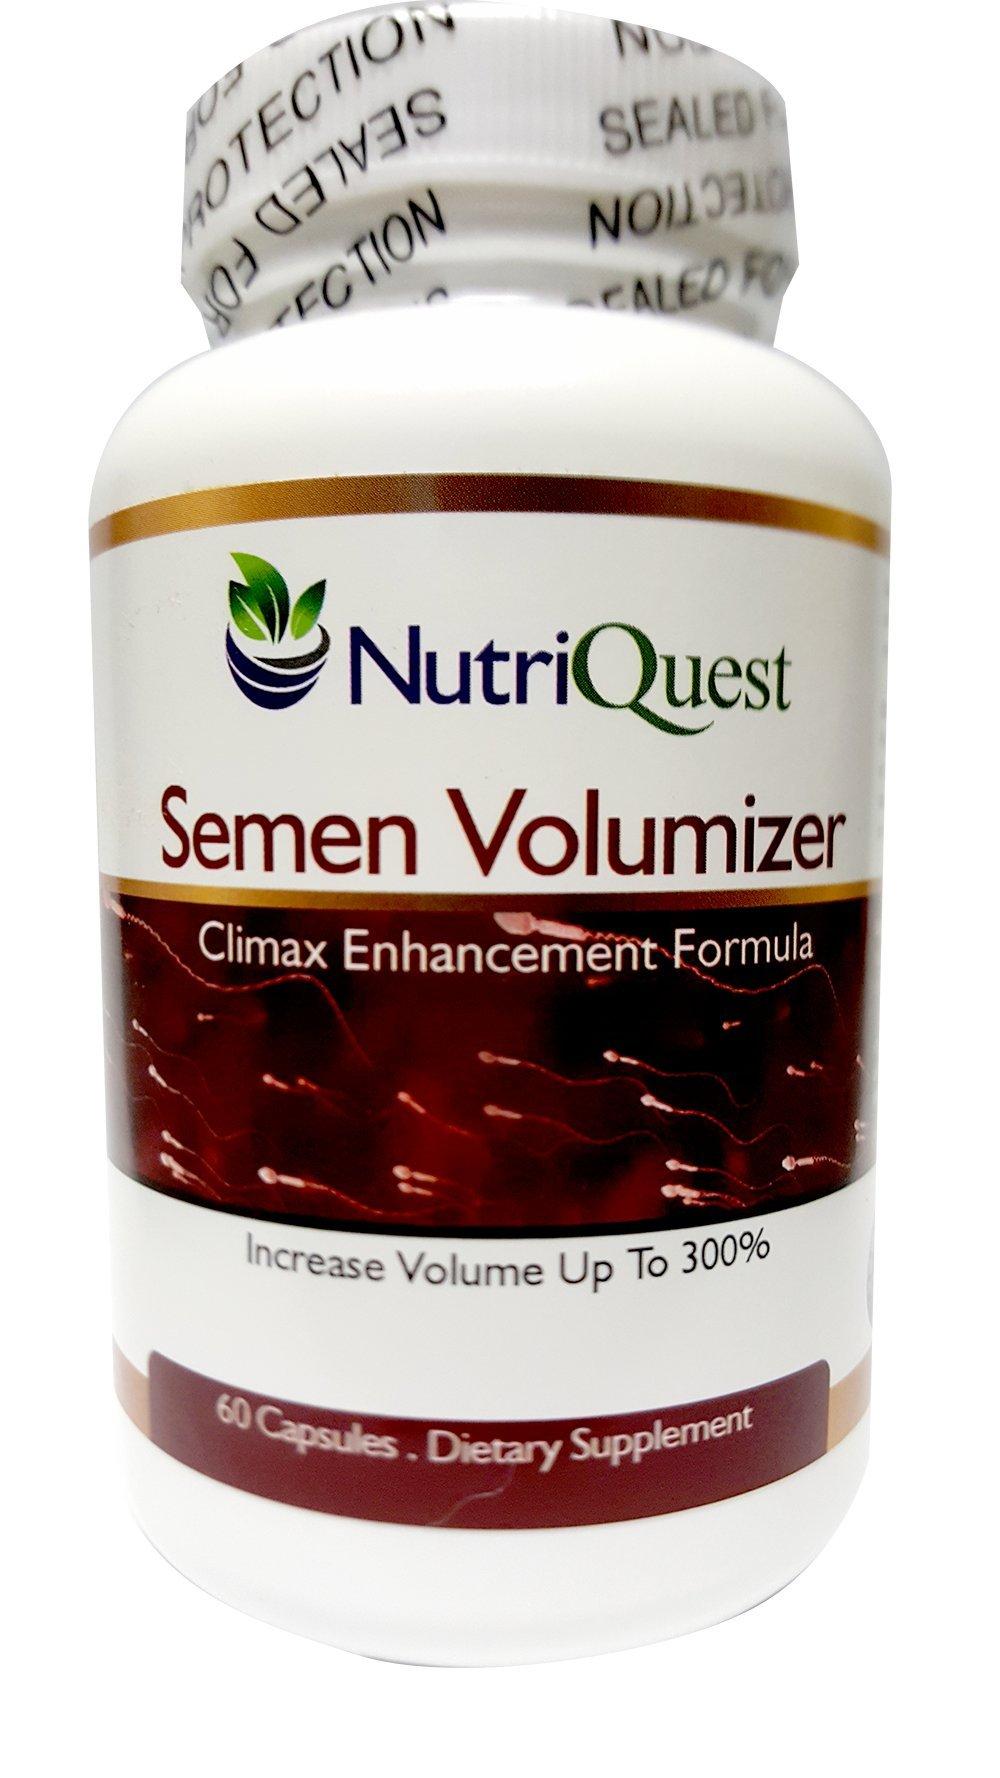 NutriQuest Fertility Supplement - 300% Increase in Volume